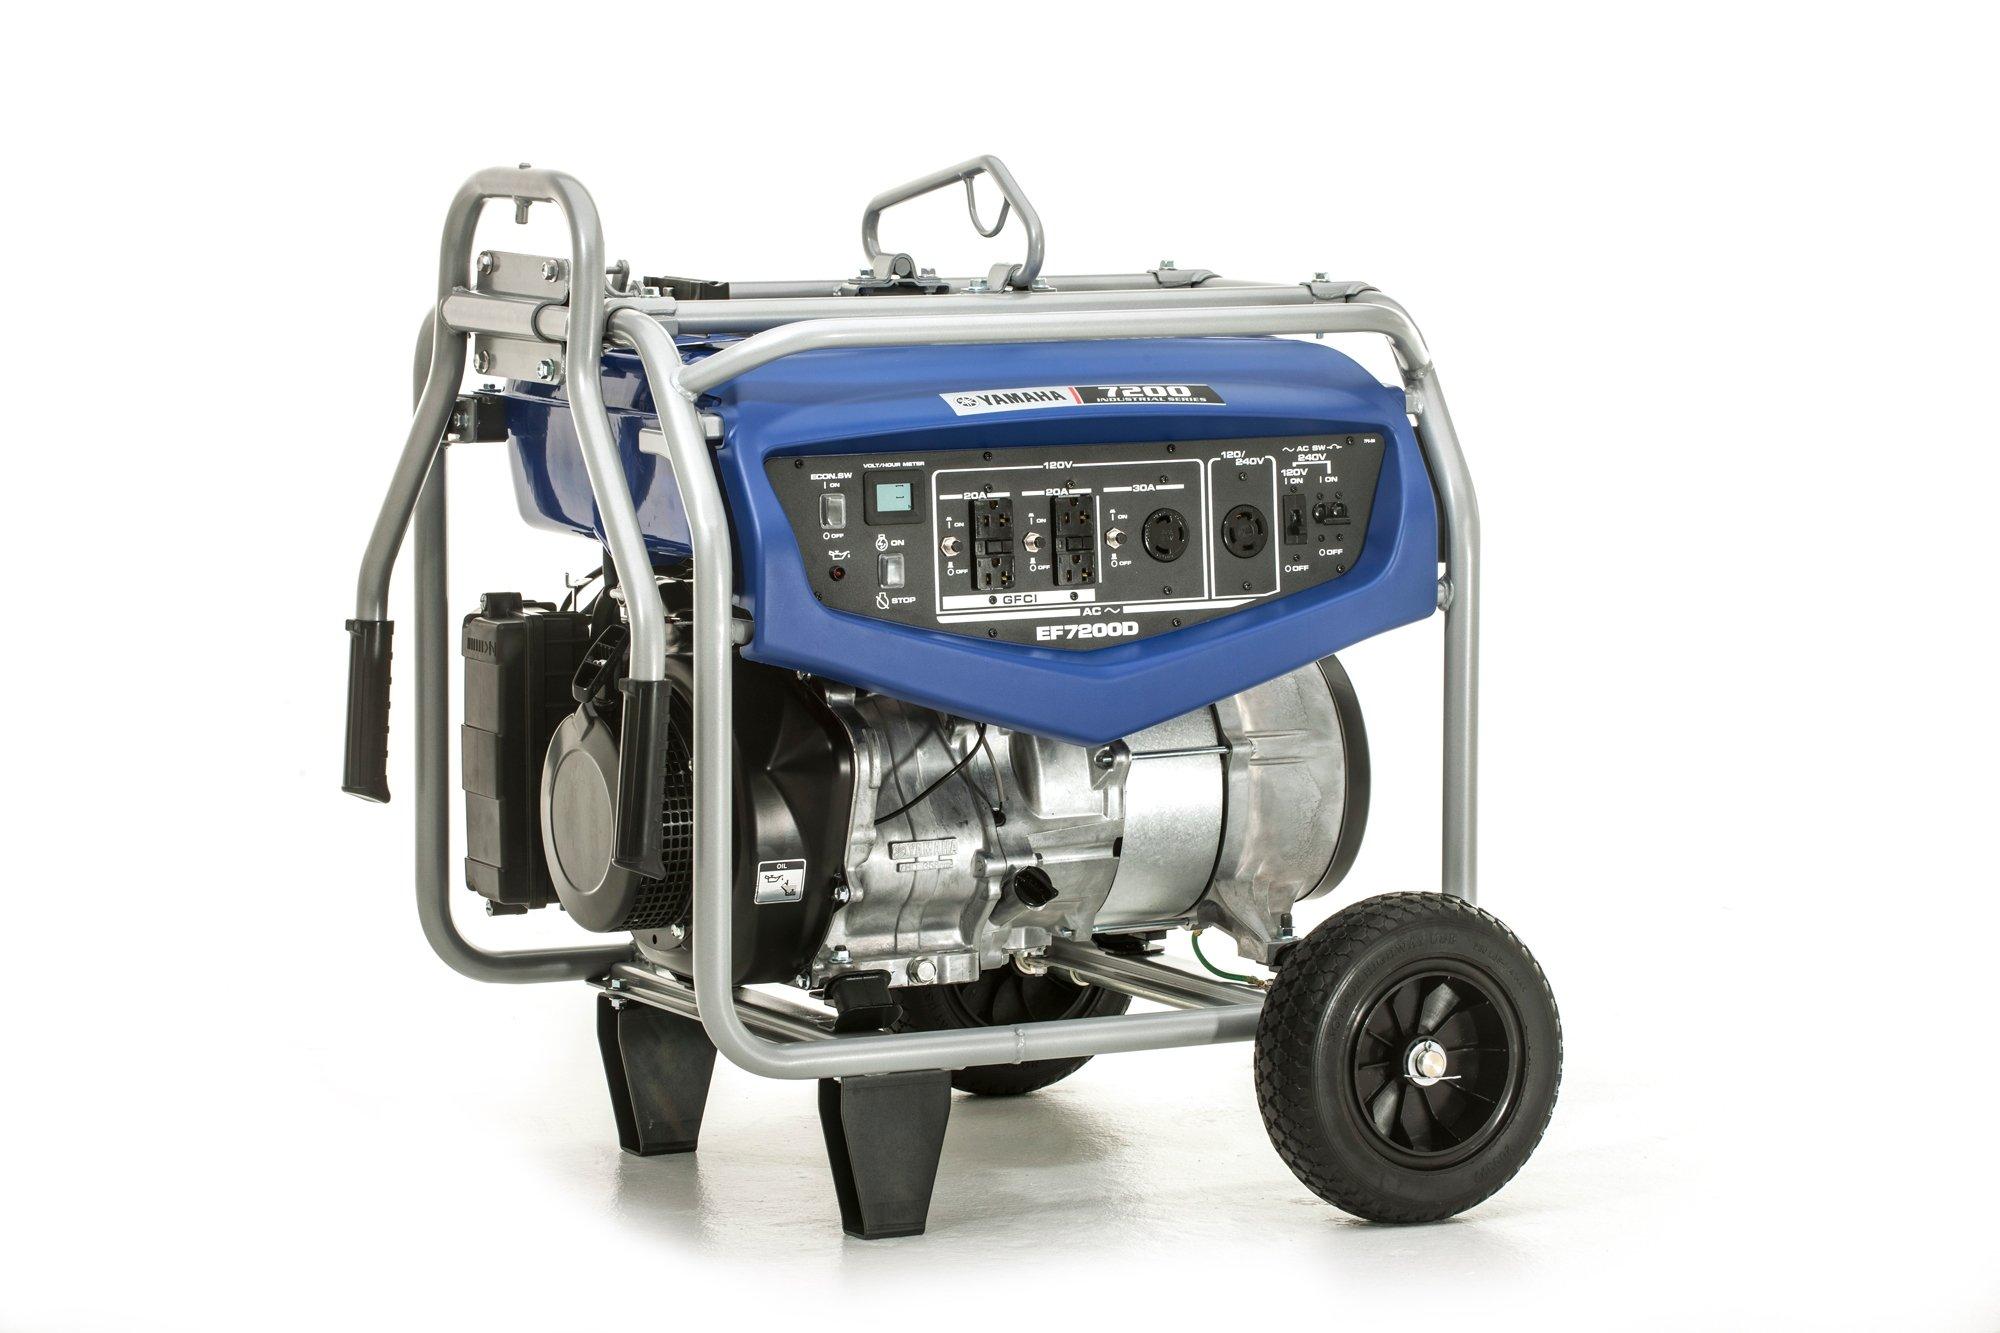 Get Quotations · Yamaha EF7200D Generator with Manual Start, 7200-watt